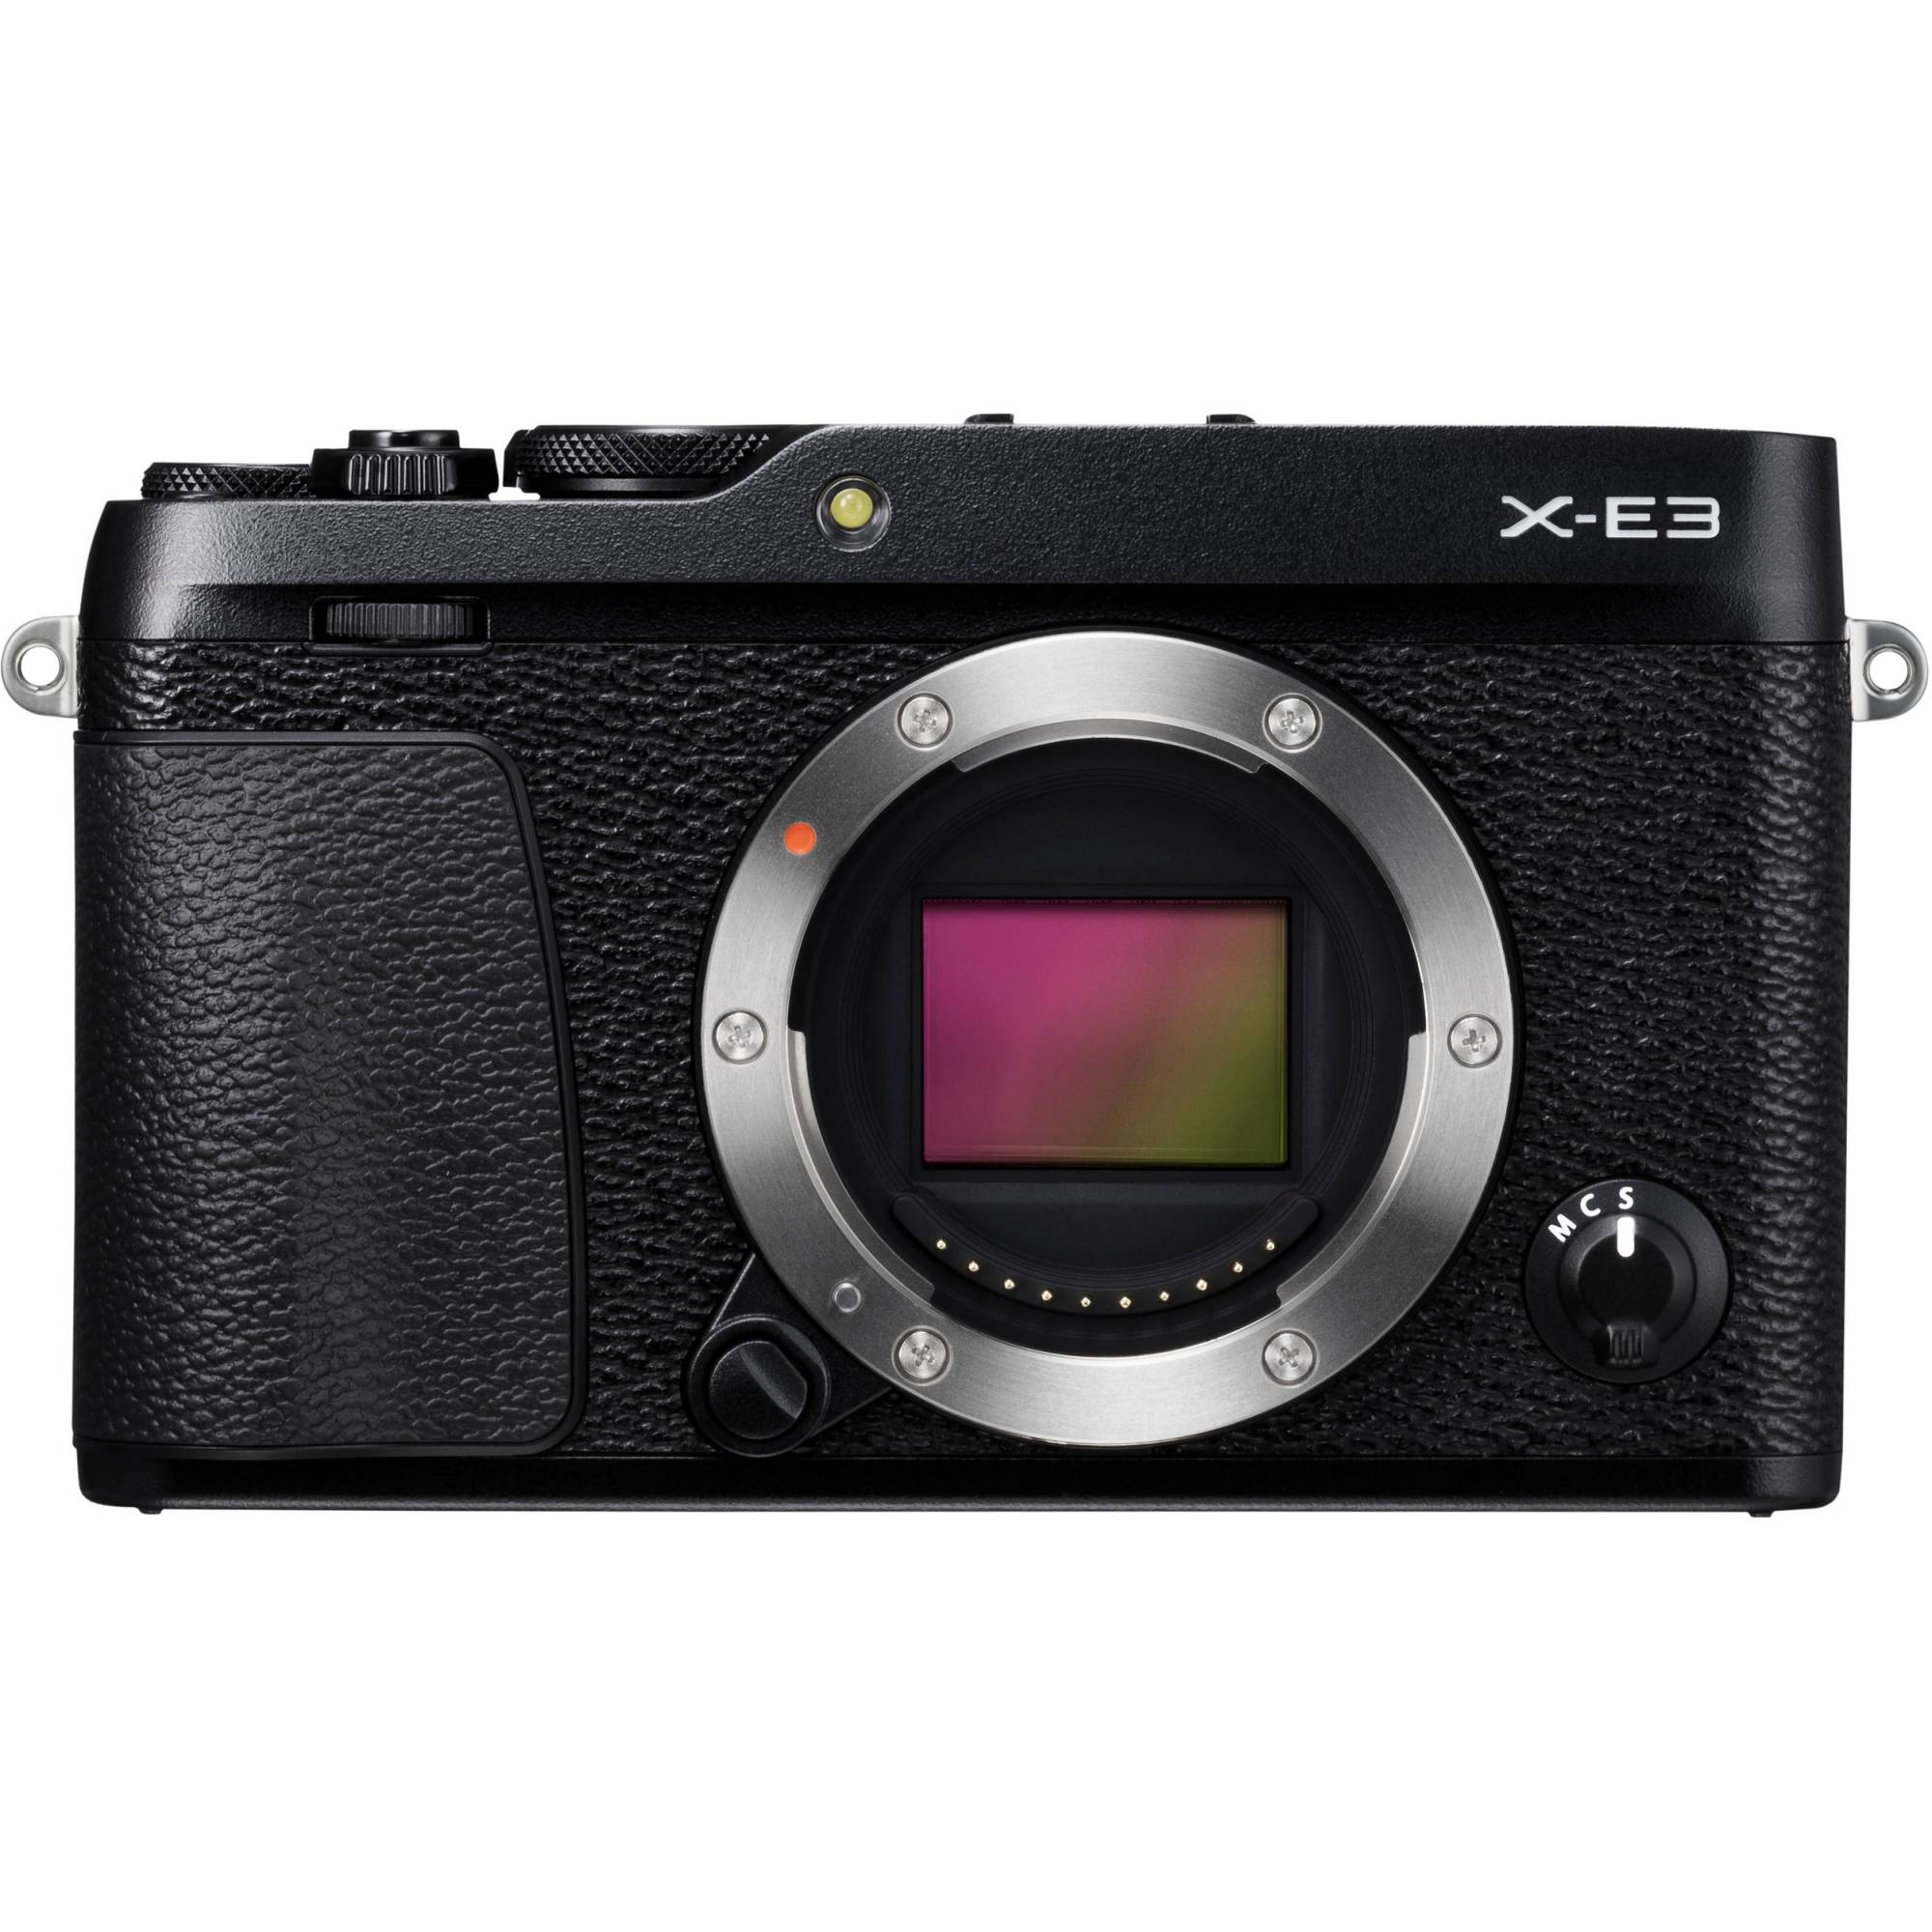 hight resolution of fujifilm x e3 mirrorless digital camera body only black